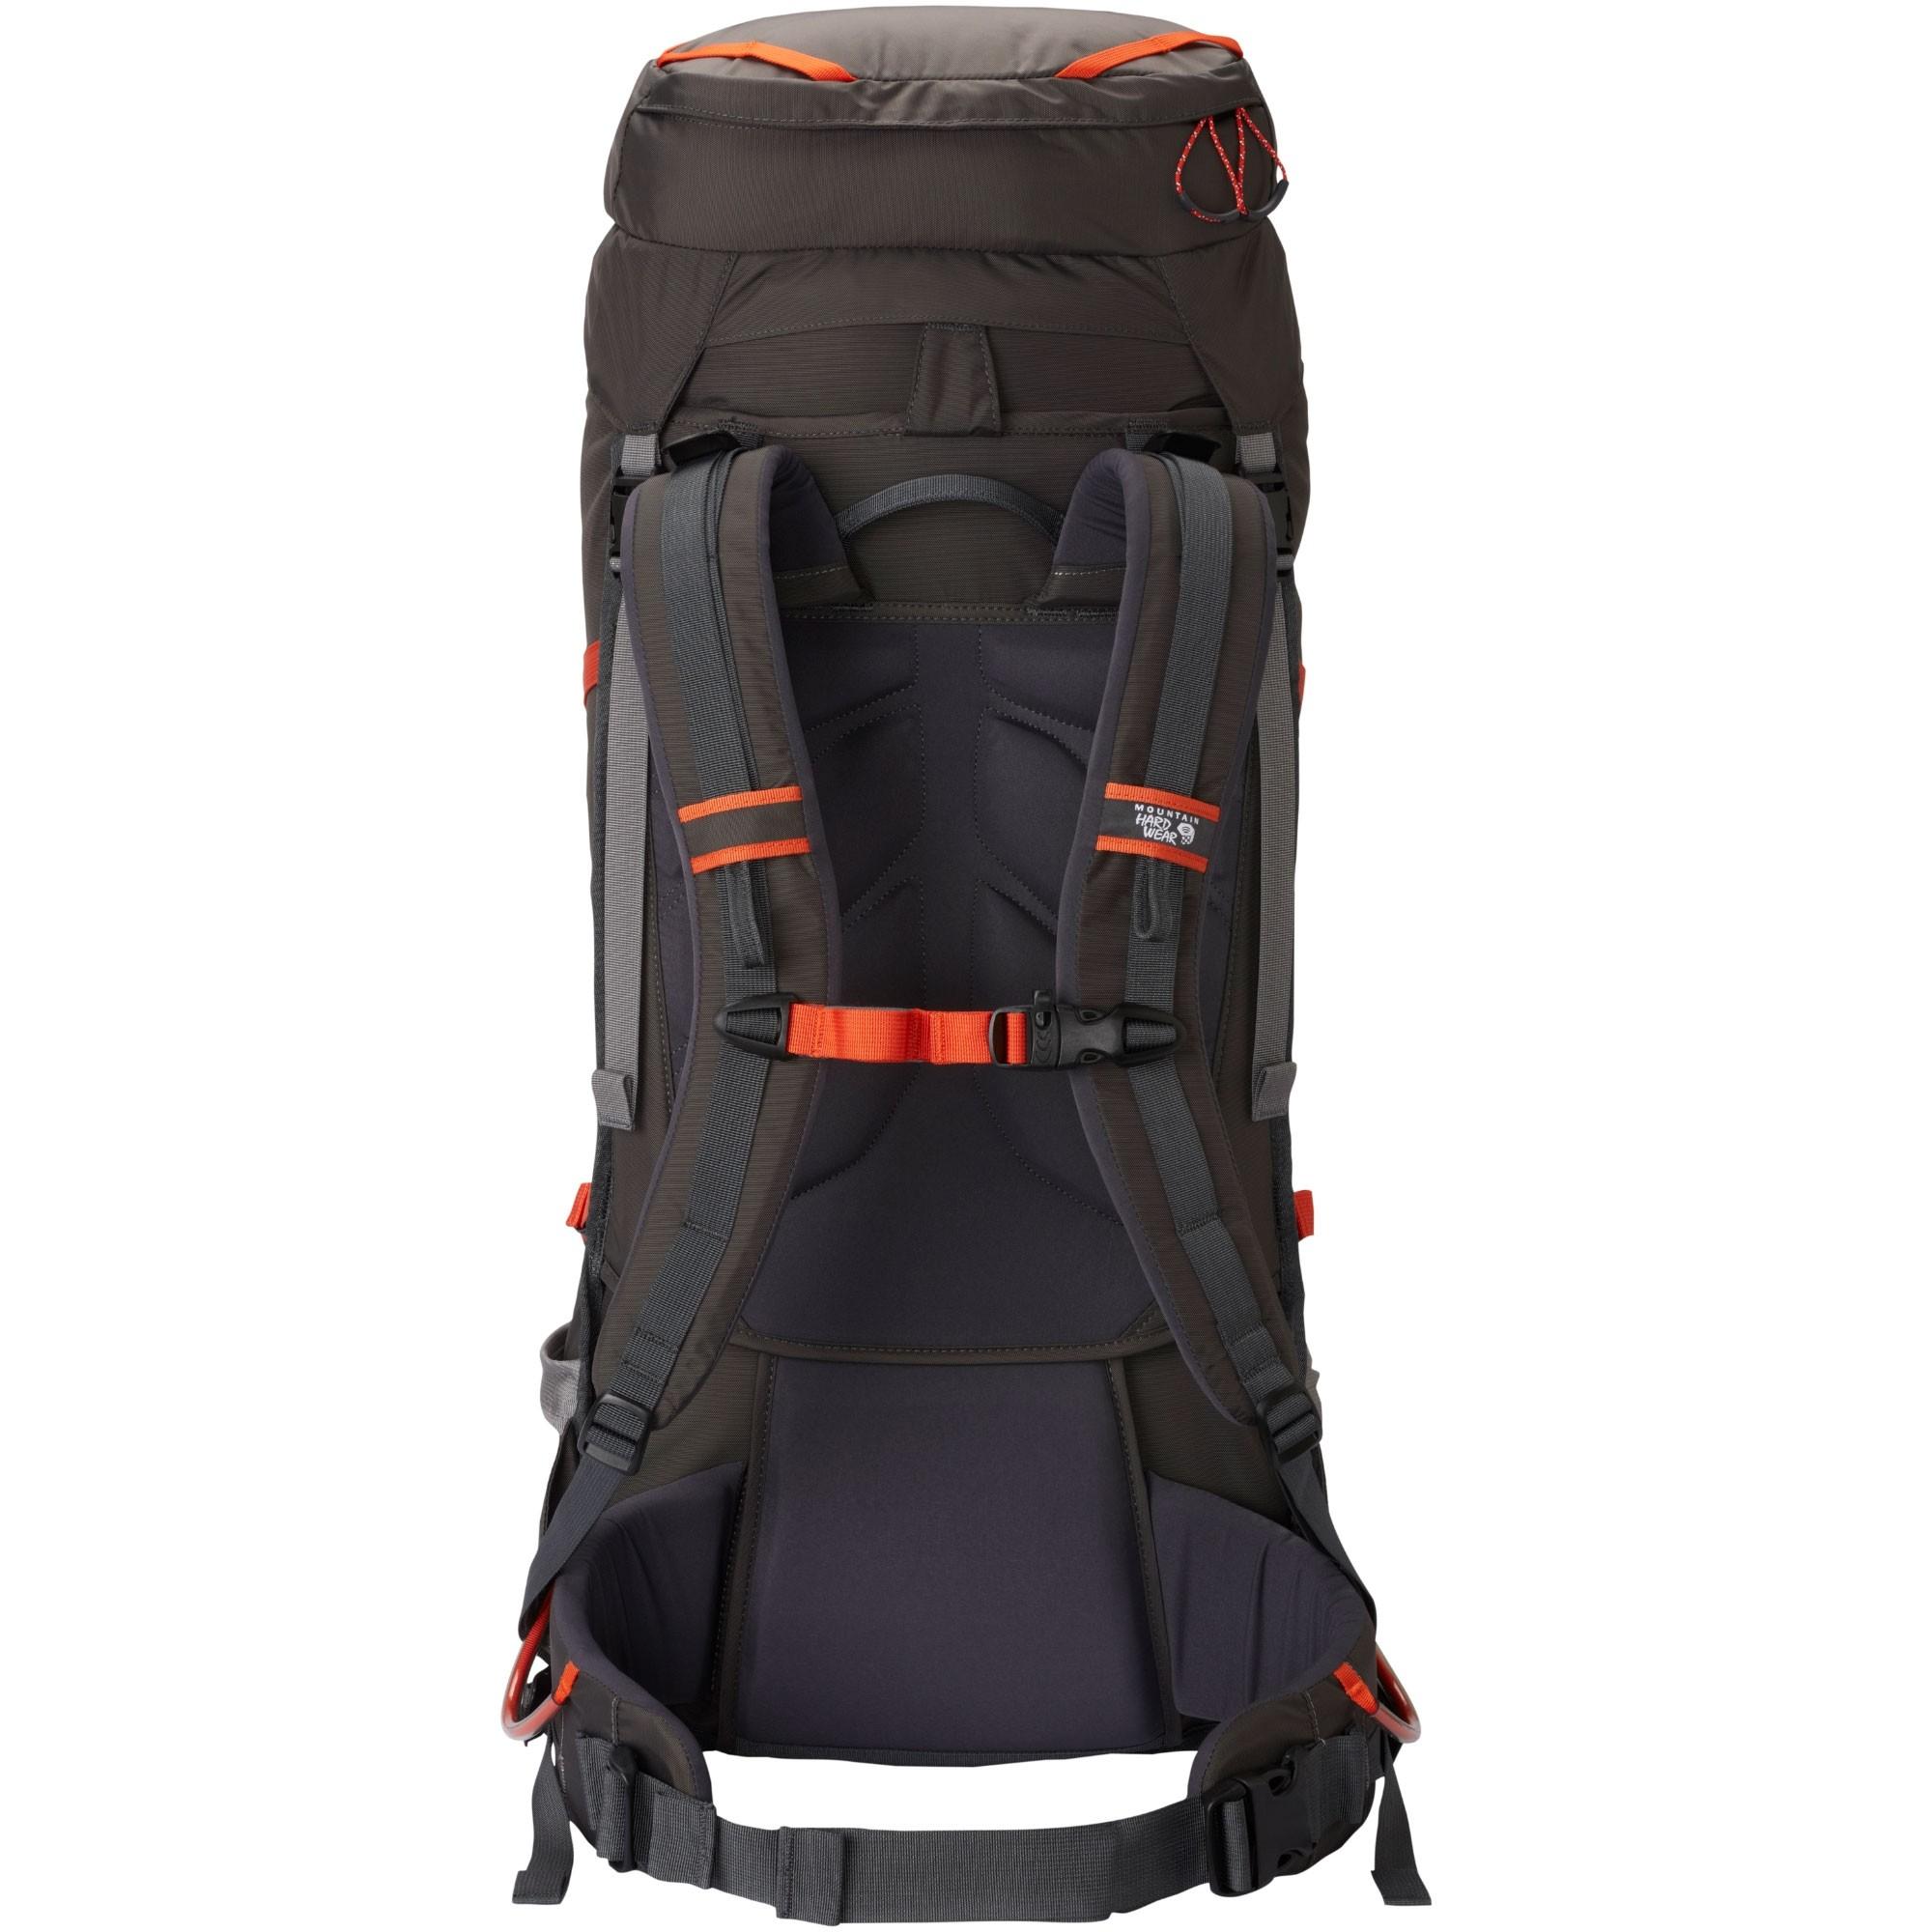 Mountain Hardwear Direttissima 35 OutDry Backpack - Shark